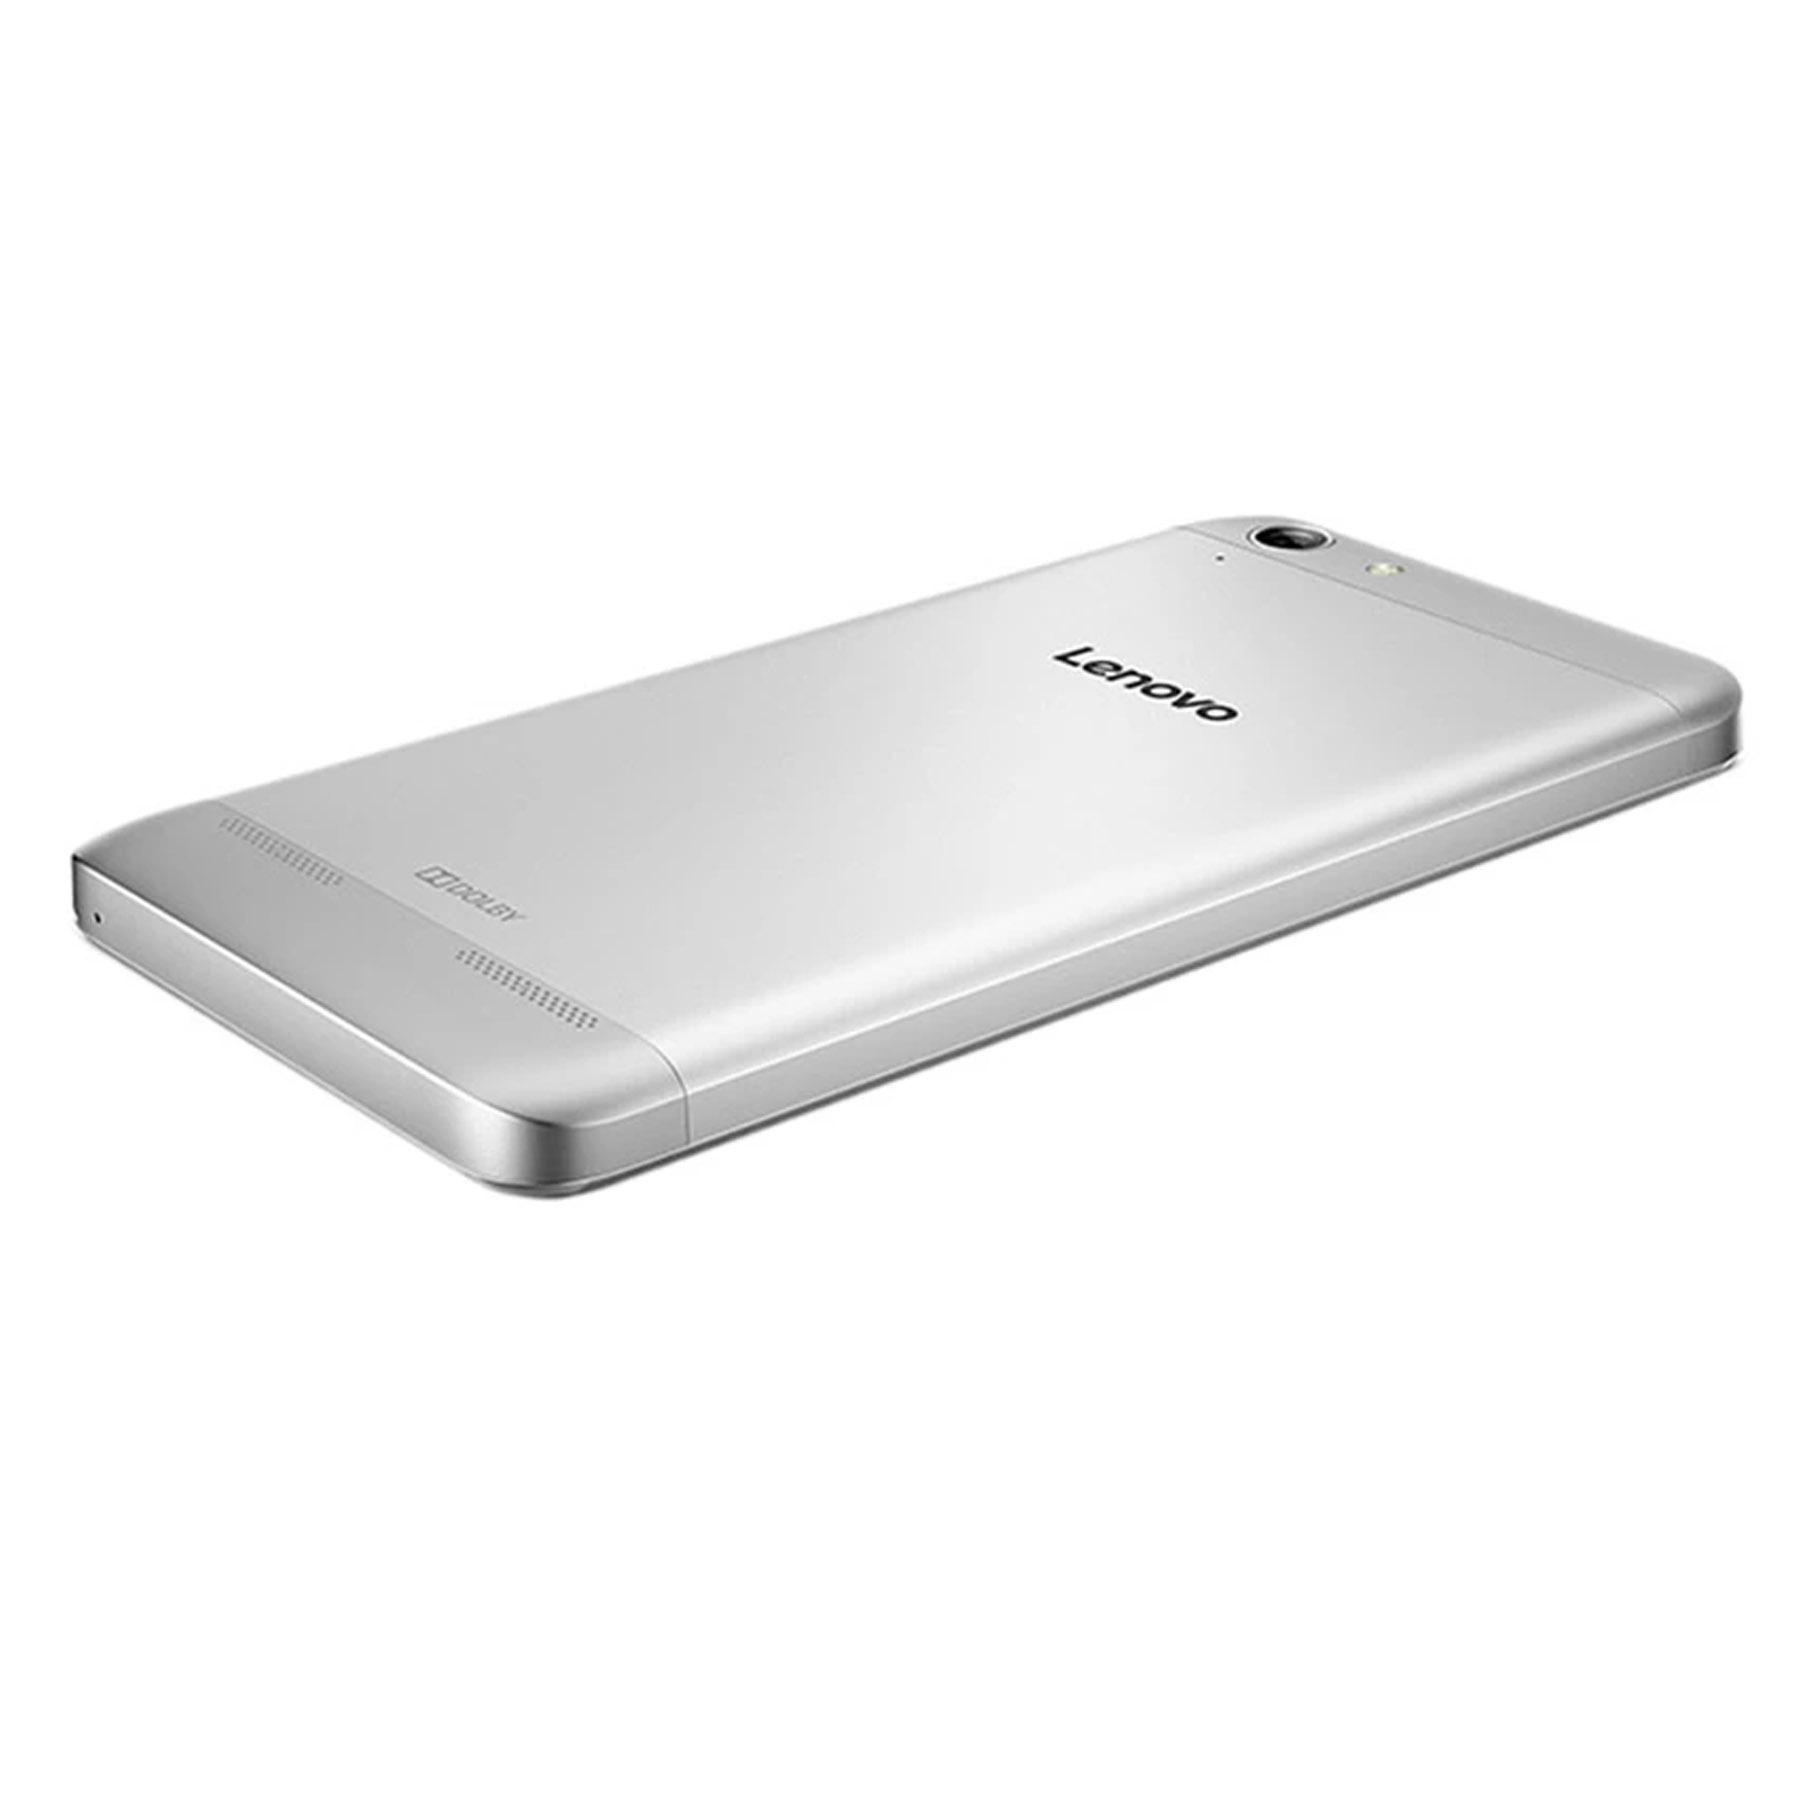 Lenovo K5 Plus Ram 3gb Rom 16gb Garansi Resmi Daftar Harga Terkini Abu Free Antvr Indonesia Vibe A6020